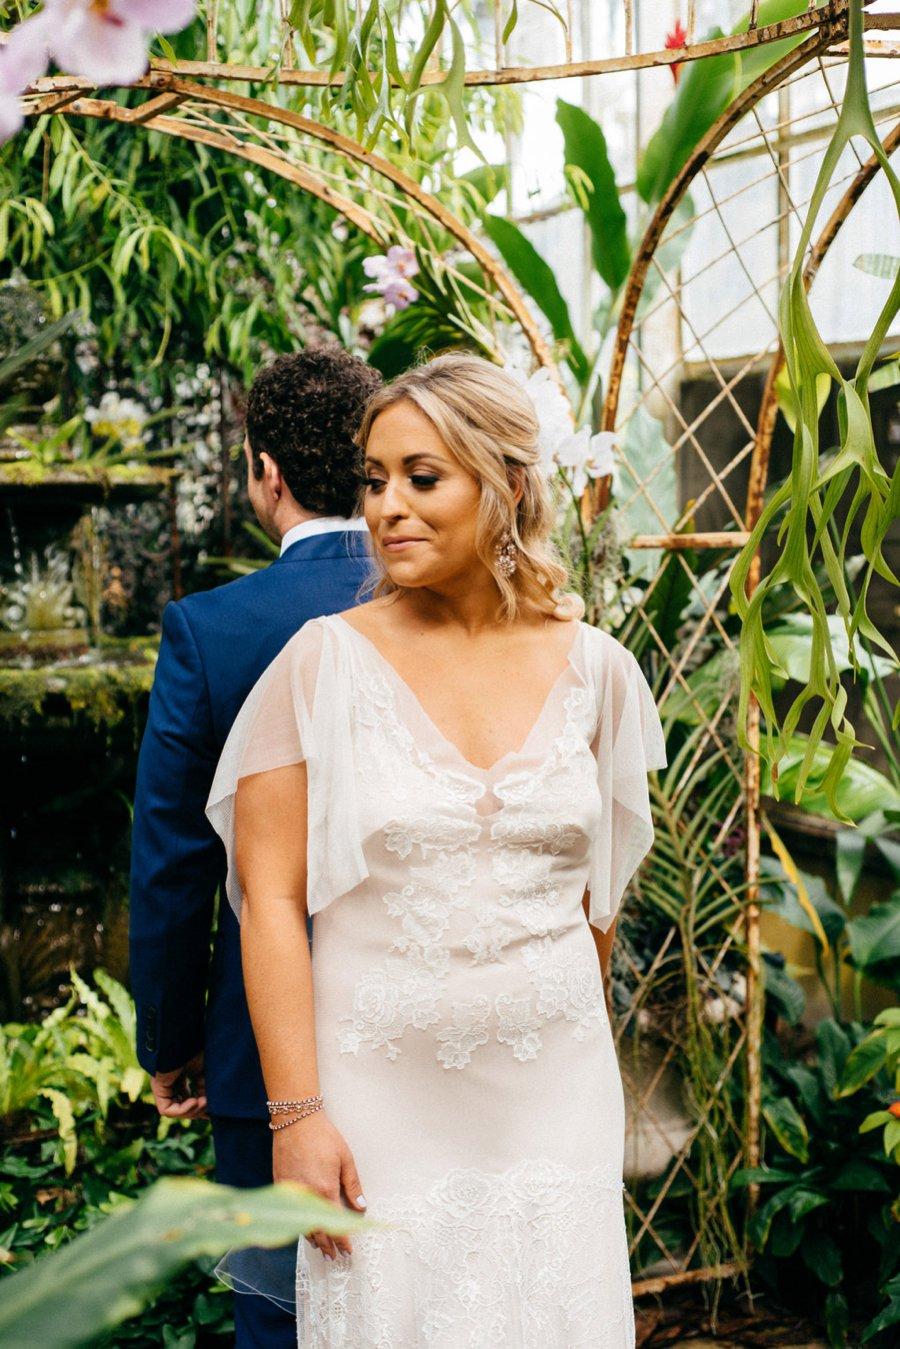 A Burgundy and Blush Ethereal Florida Garden Wedding via TheELD.com